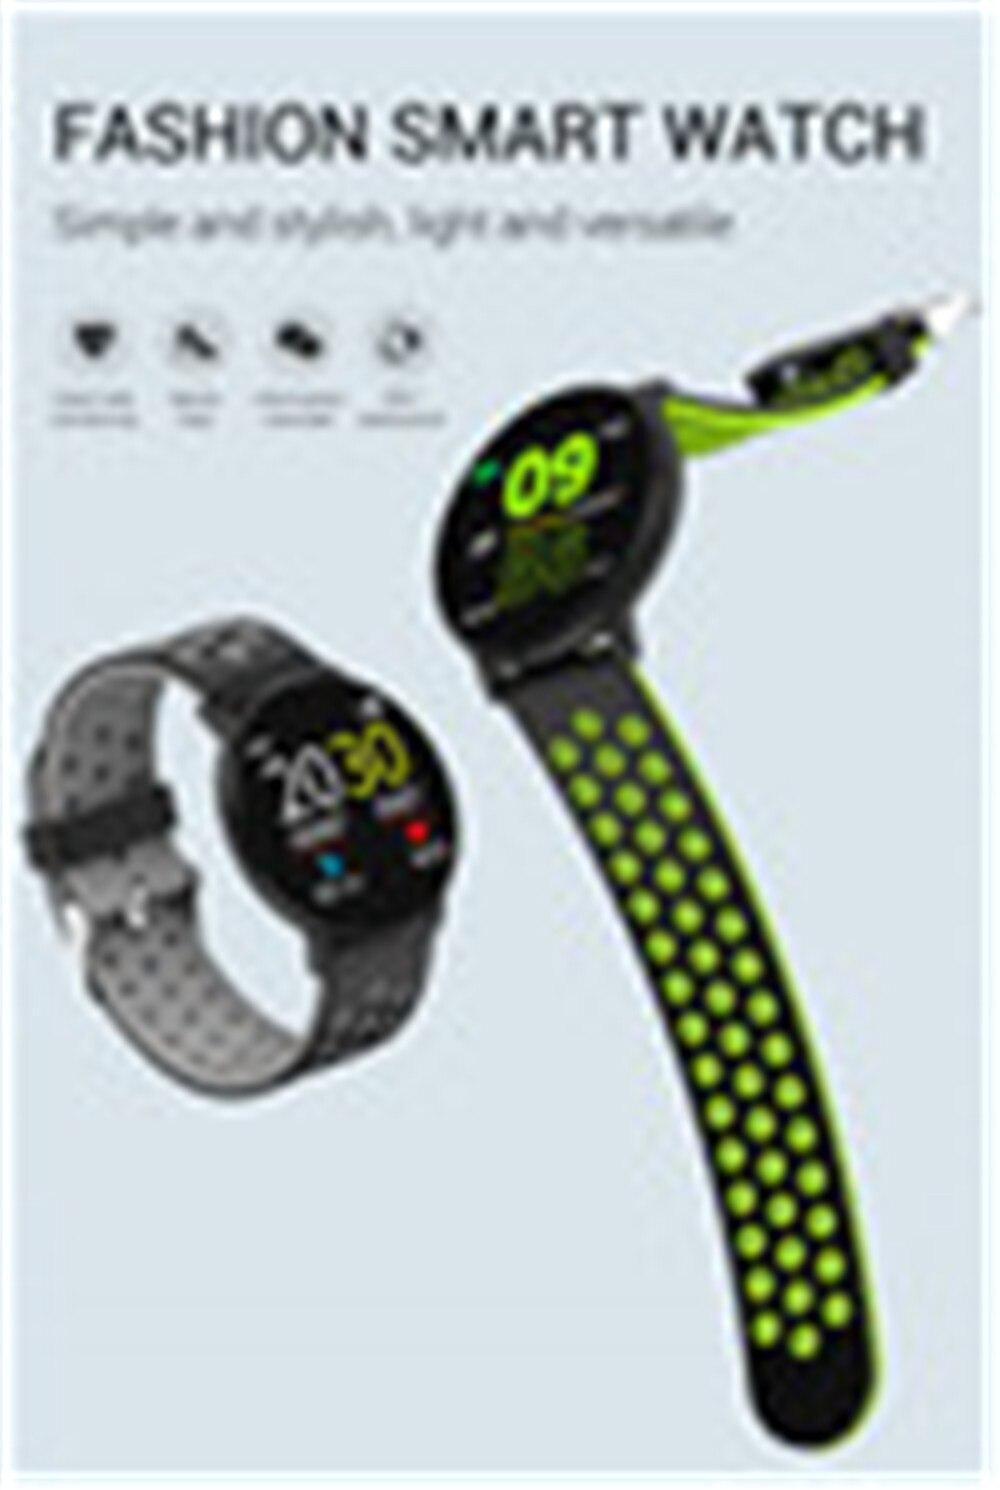 Hea85fdbbc8534cb6b28297e18fb0cd91q Fitness Bracelet 1.3'' Screen Smart Bracelet Blood Pressure Heart Rate Monitor Fitness Tracker Waterproof Ip67 Smart Band Watch